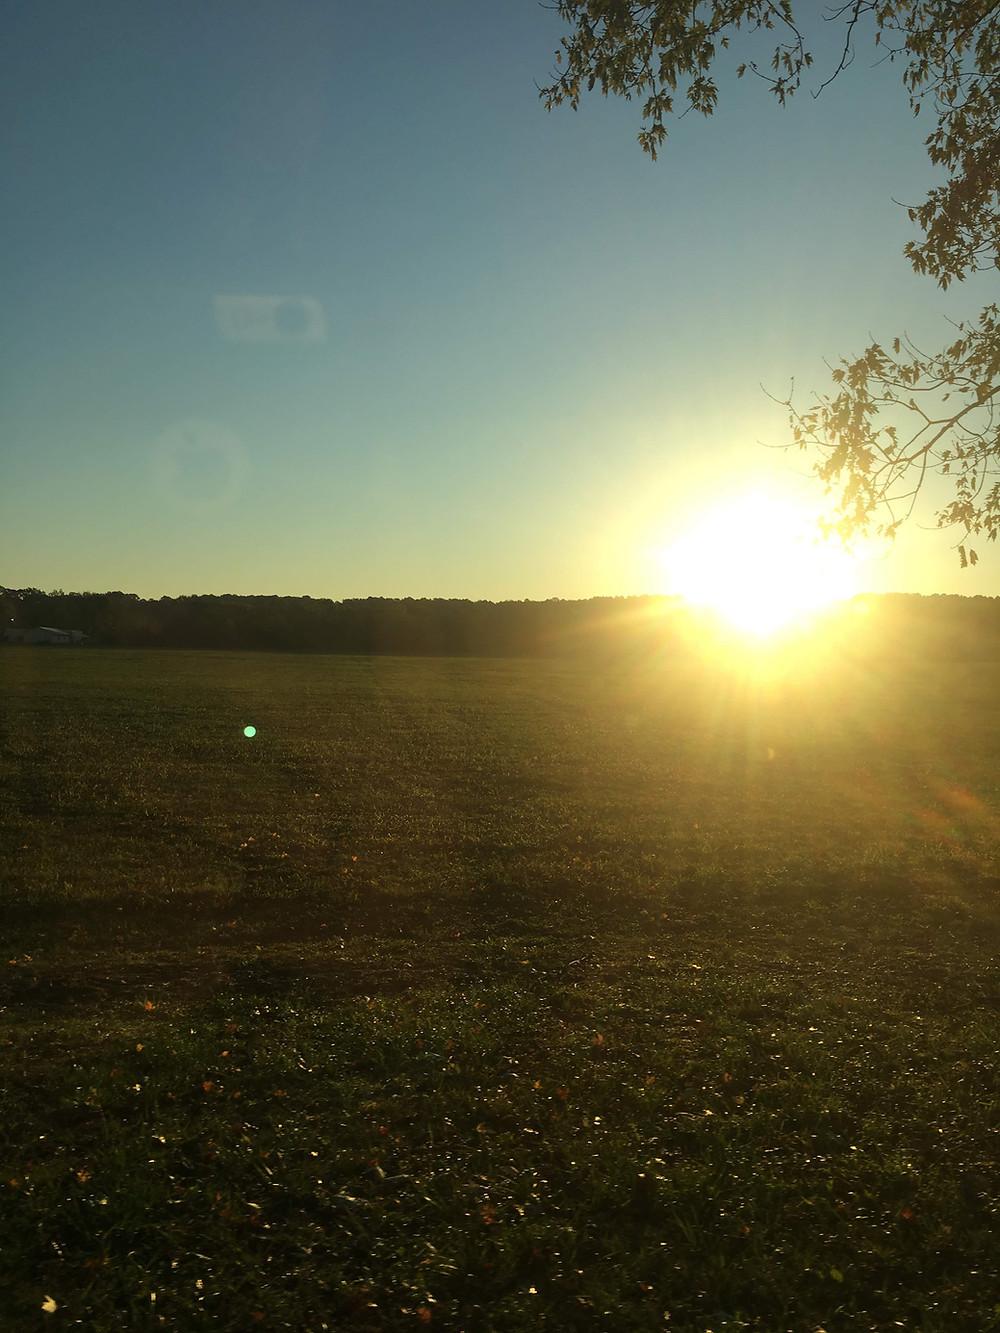 Sun cresting horizen